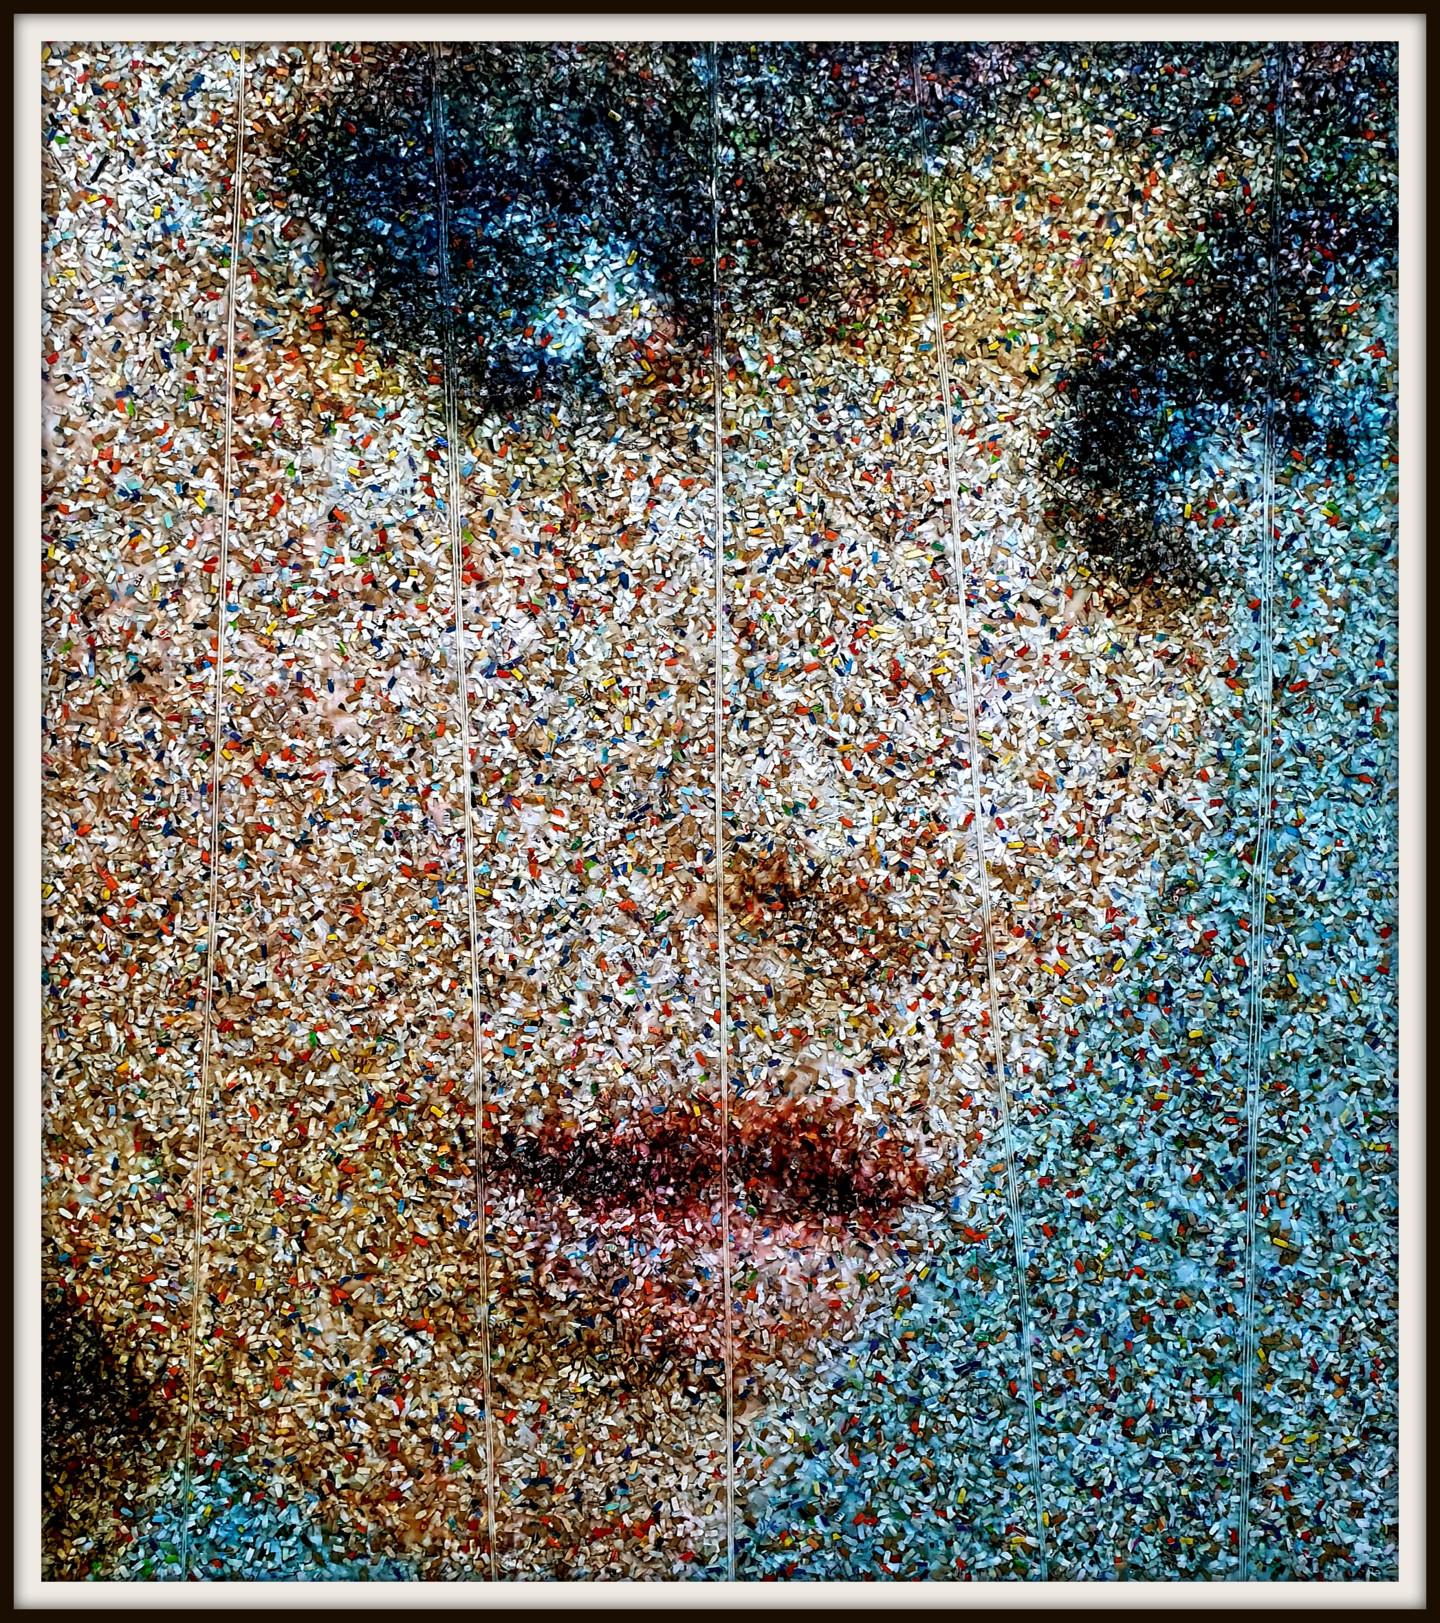 Alessio Mazzarulli - It's just a little allergy - (n.526) - Dolls series